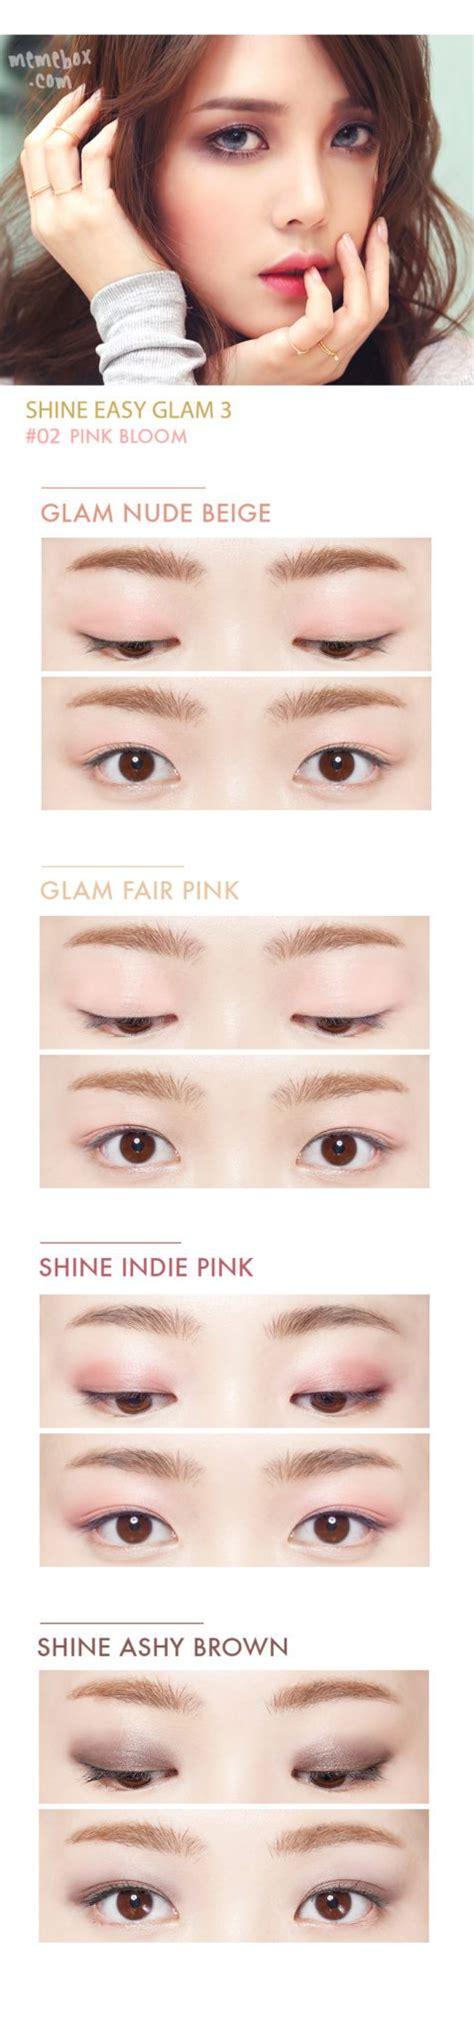 Eyeshadow Channel 03 memebox x pony shine easy glam eyeshadow palette 3